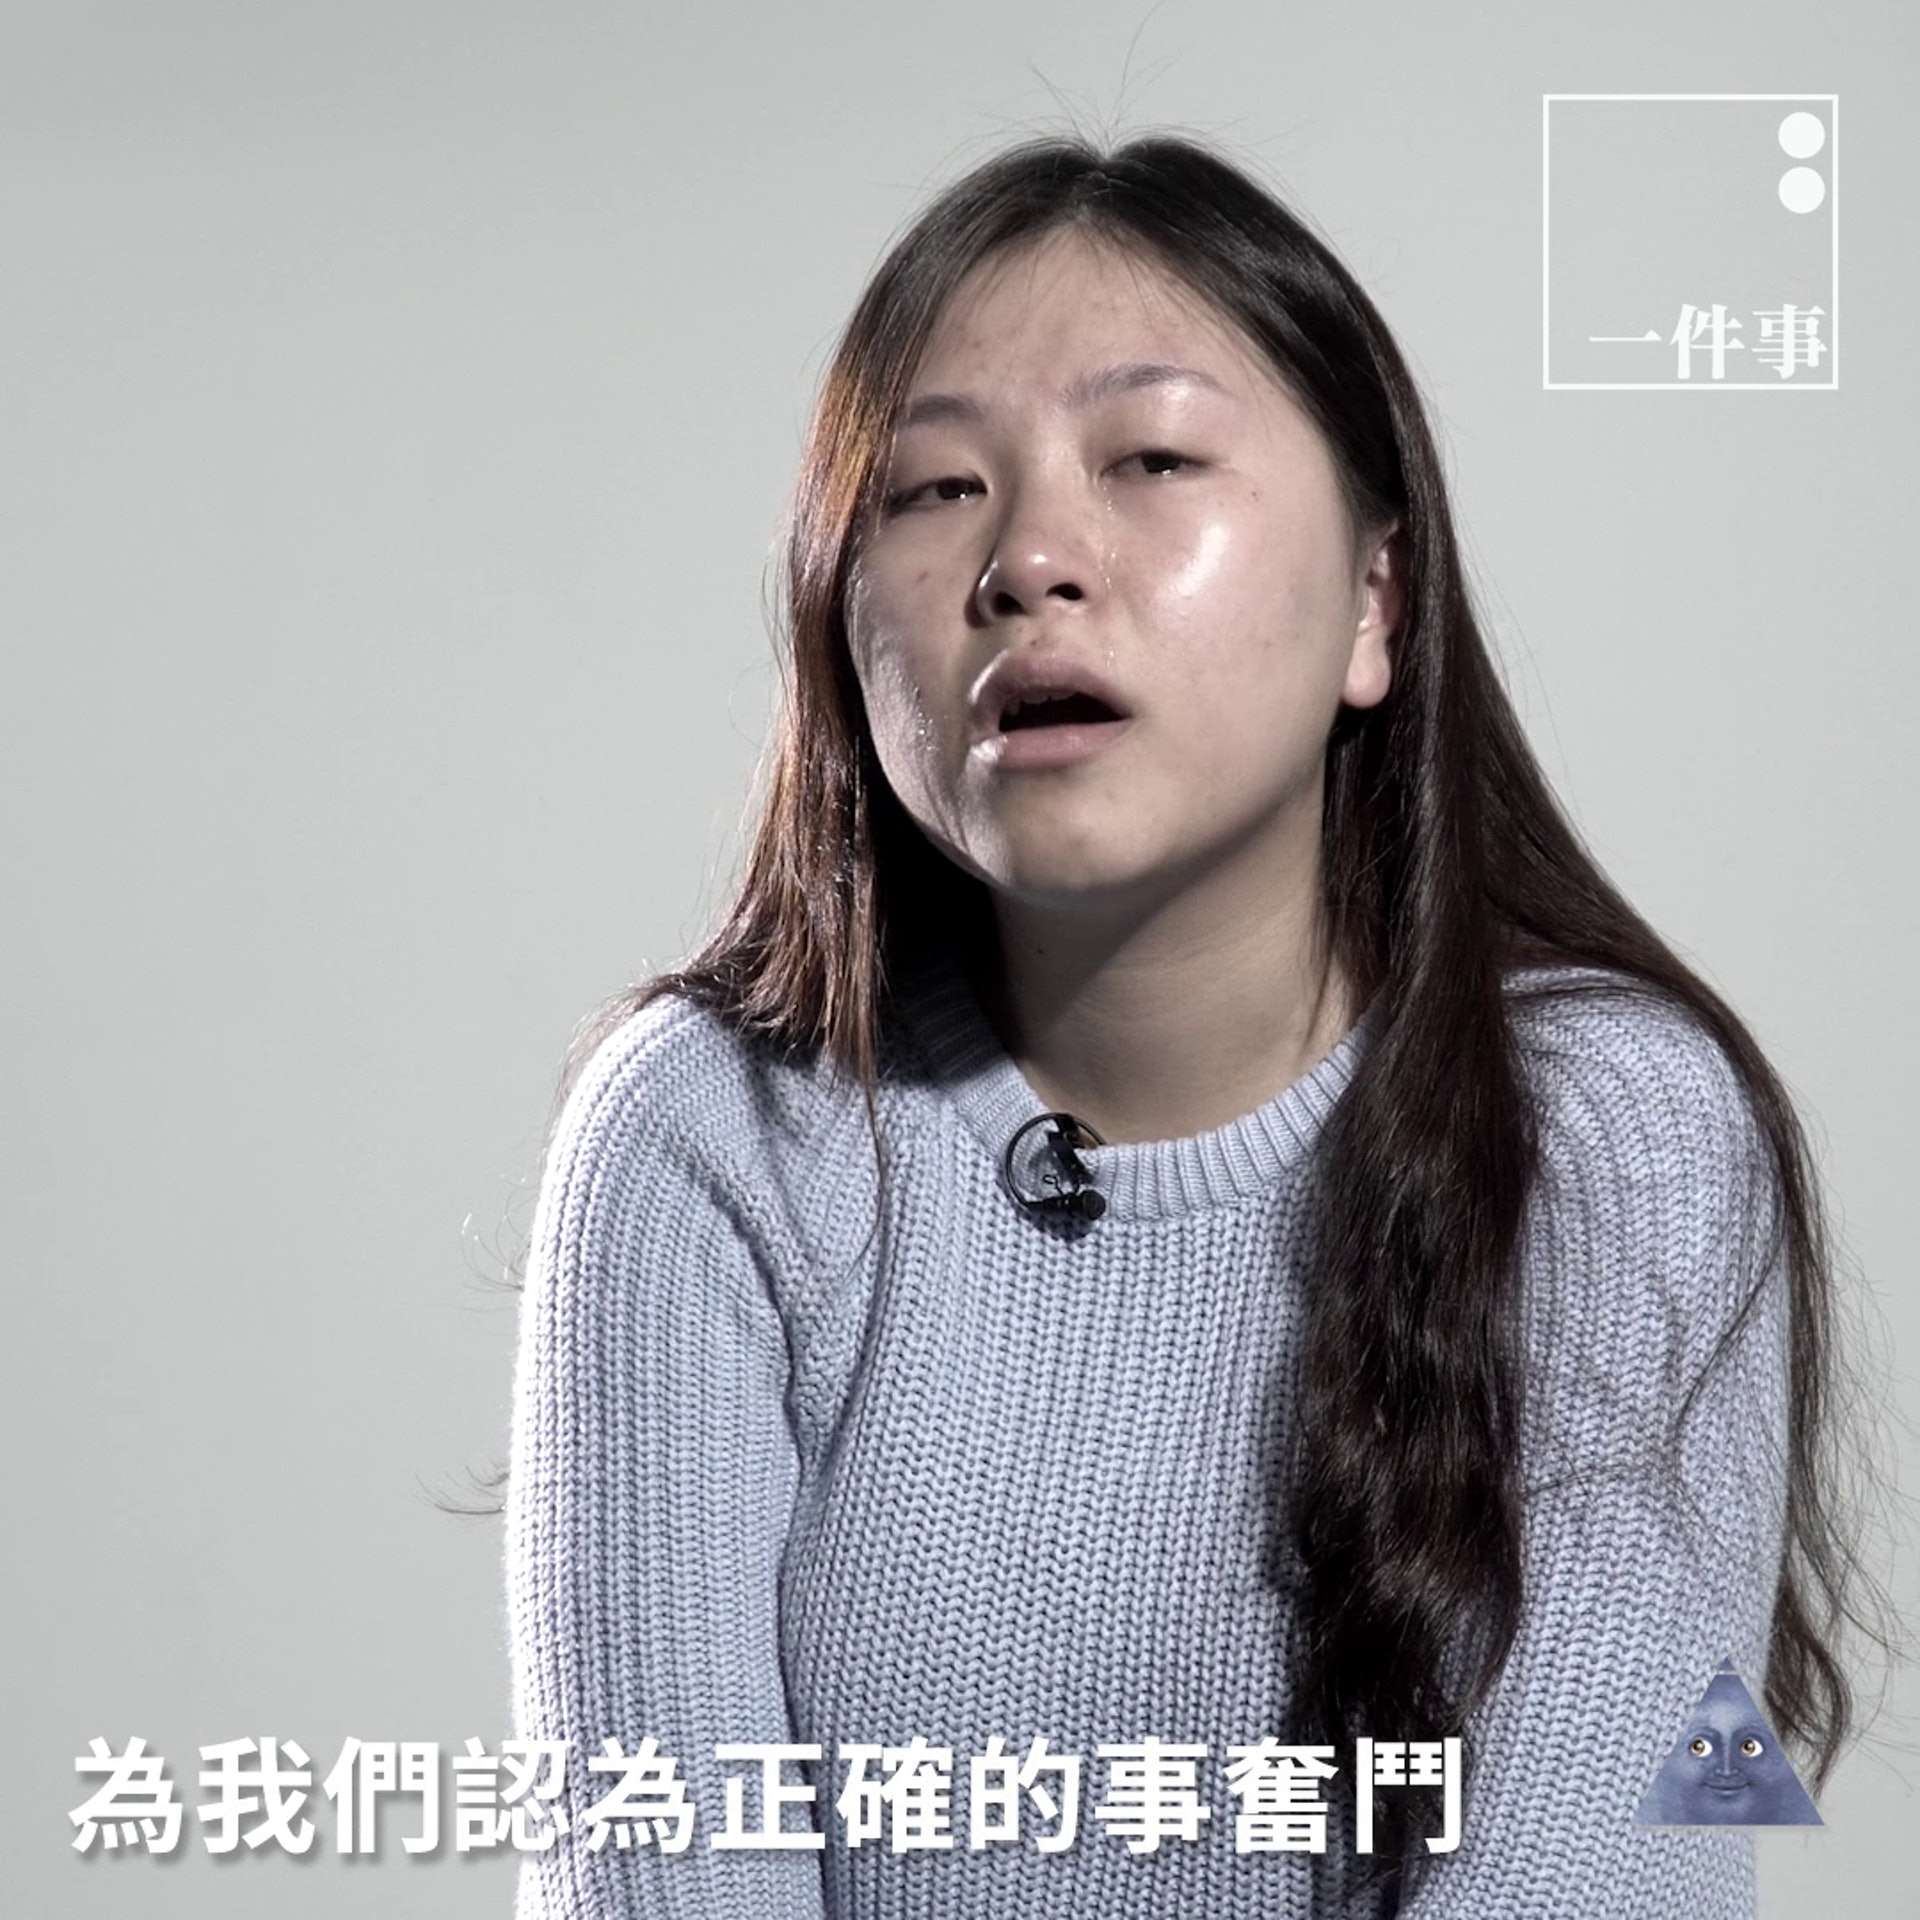 Image result for 我們會繼續為香港奮鬥。